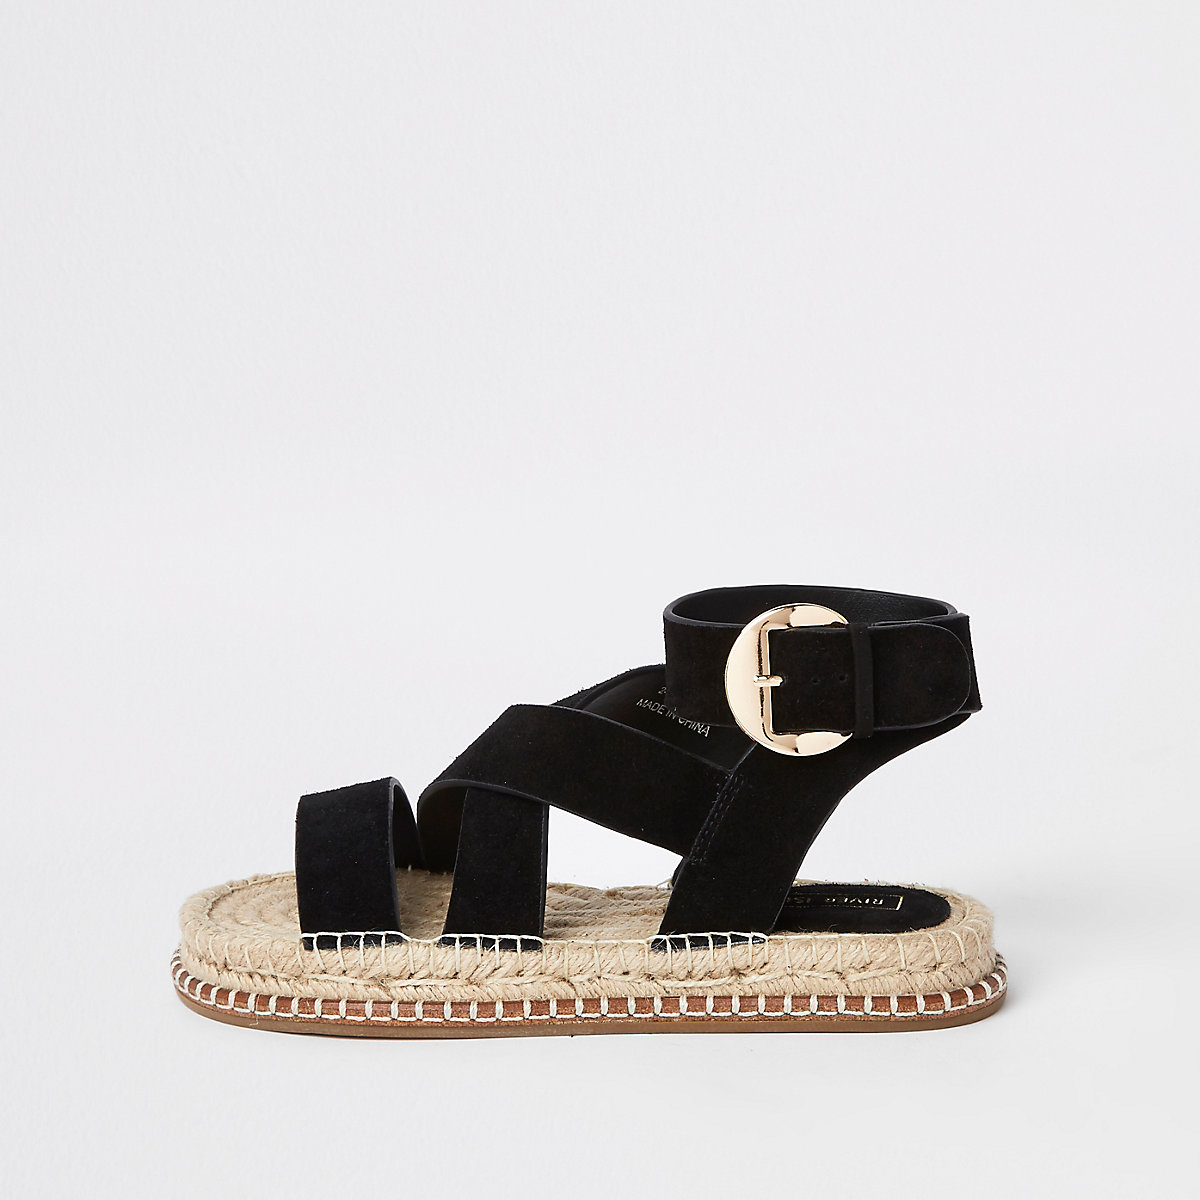 Black suede espadrille sandals